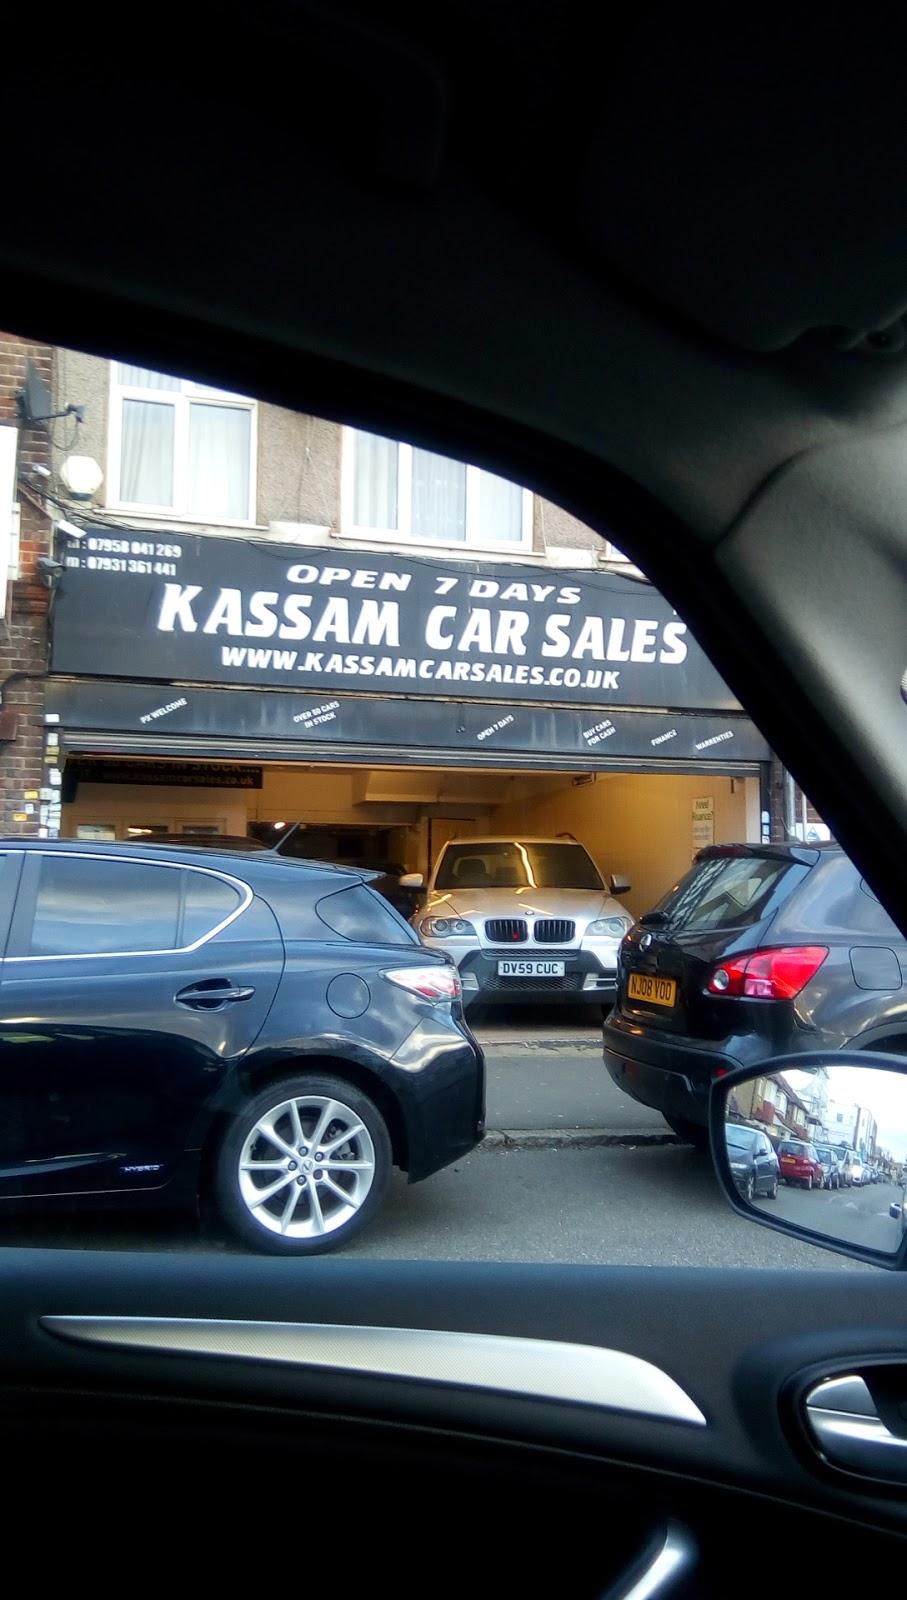 Kassam Car Sales